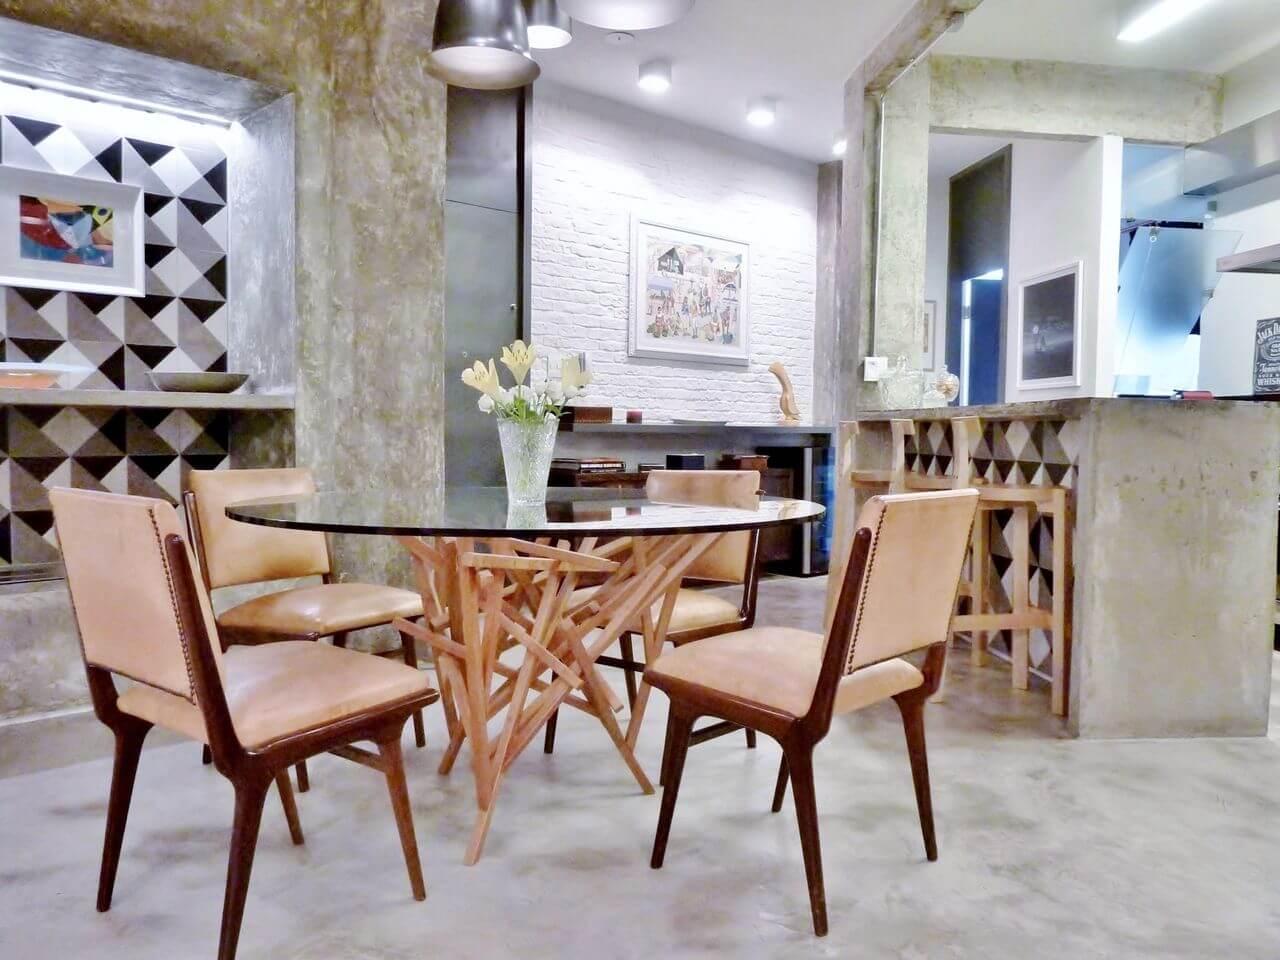 Cimento Queimado Para Piso Cuidados Com A Limpeza Do Piso De  -> Acabamento Sala De Jantar